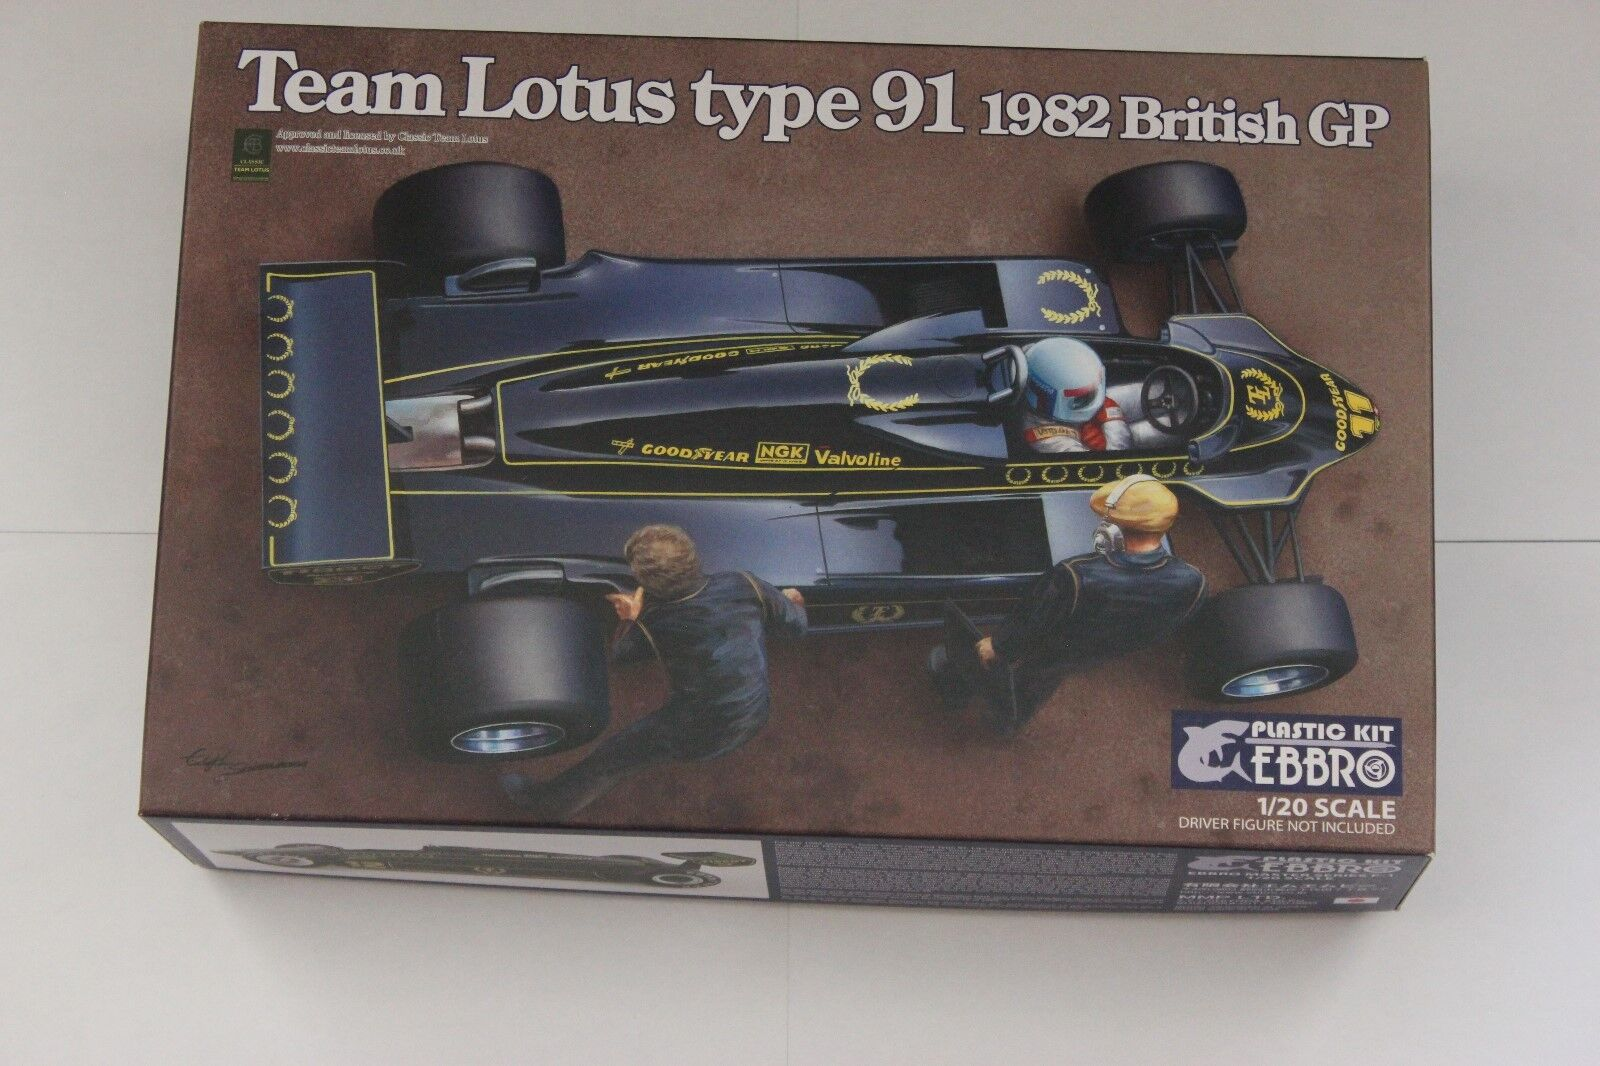 Ebbro Team Lotus Type 91  1982 British GP. No 021-5800